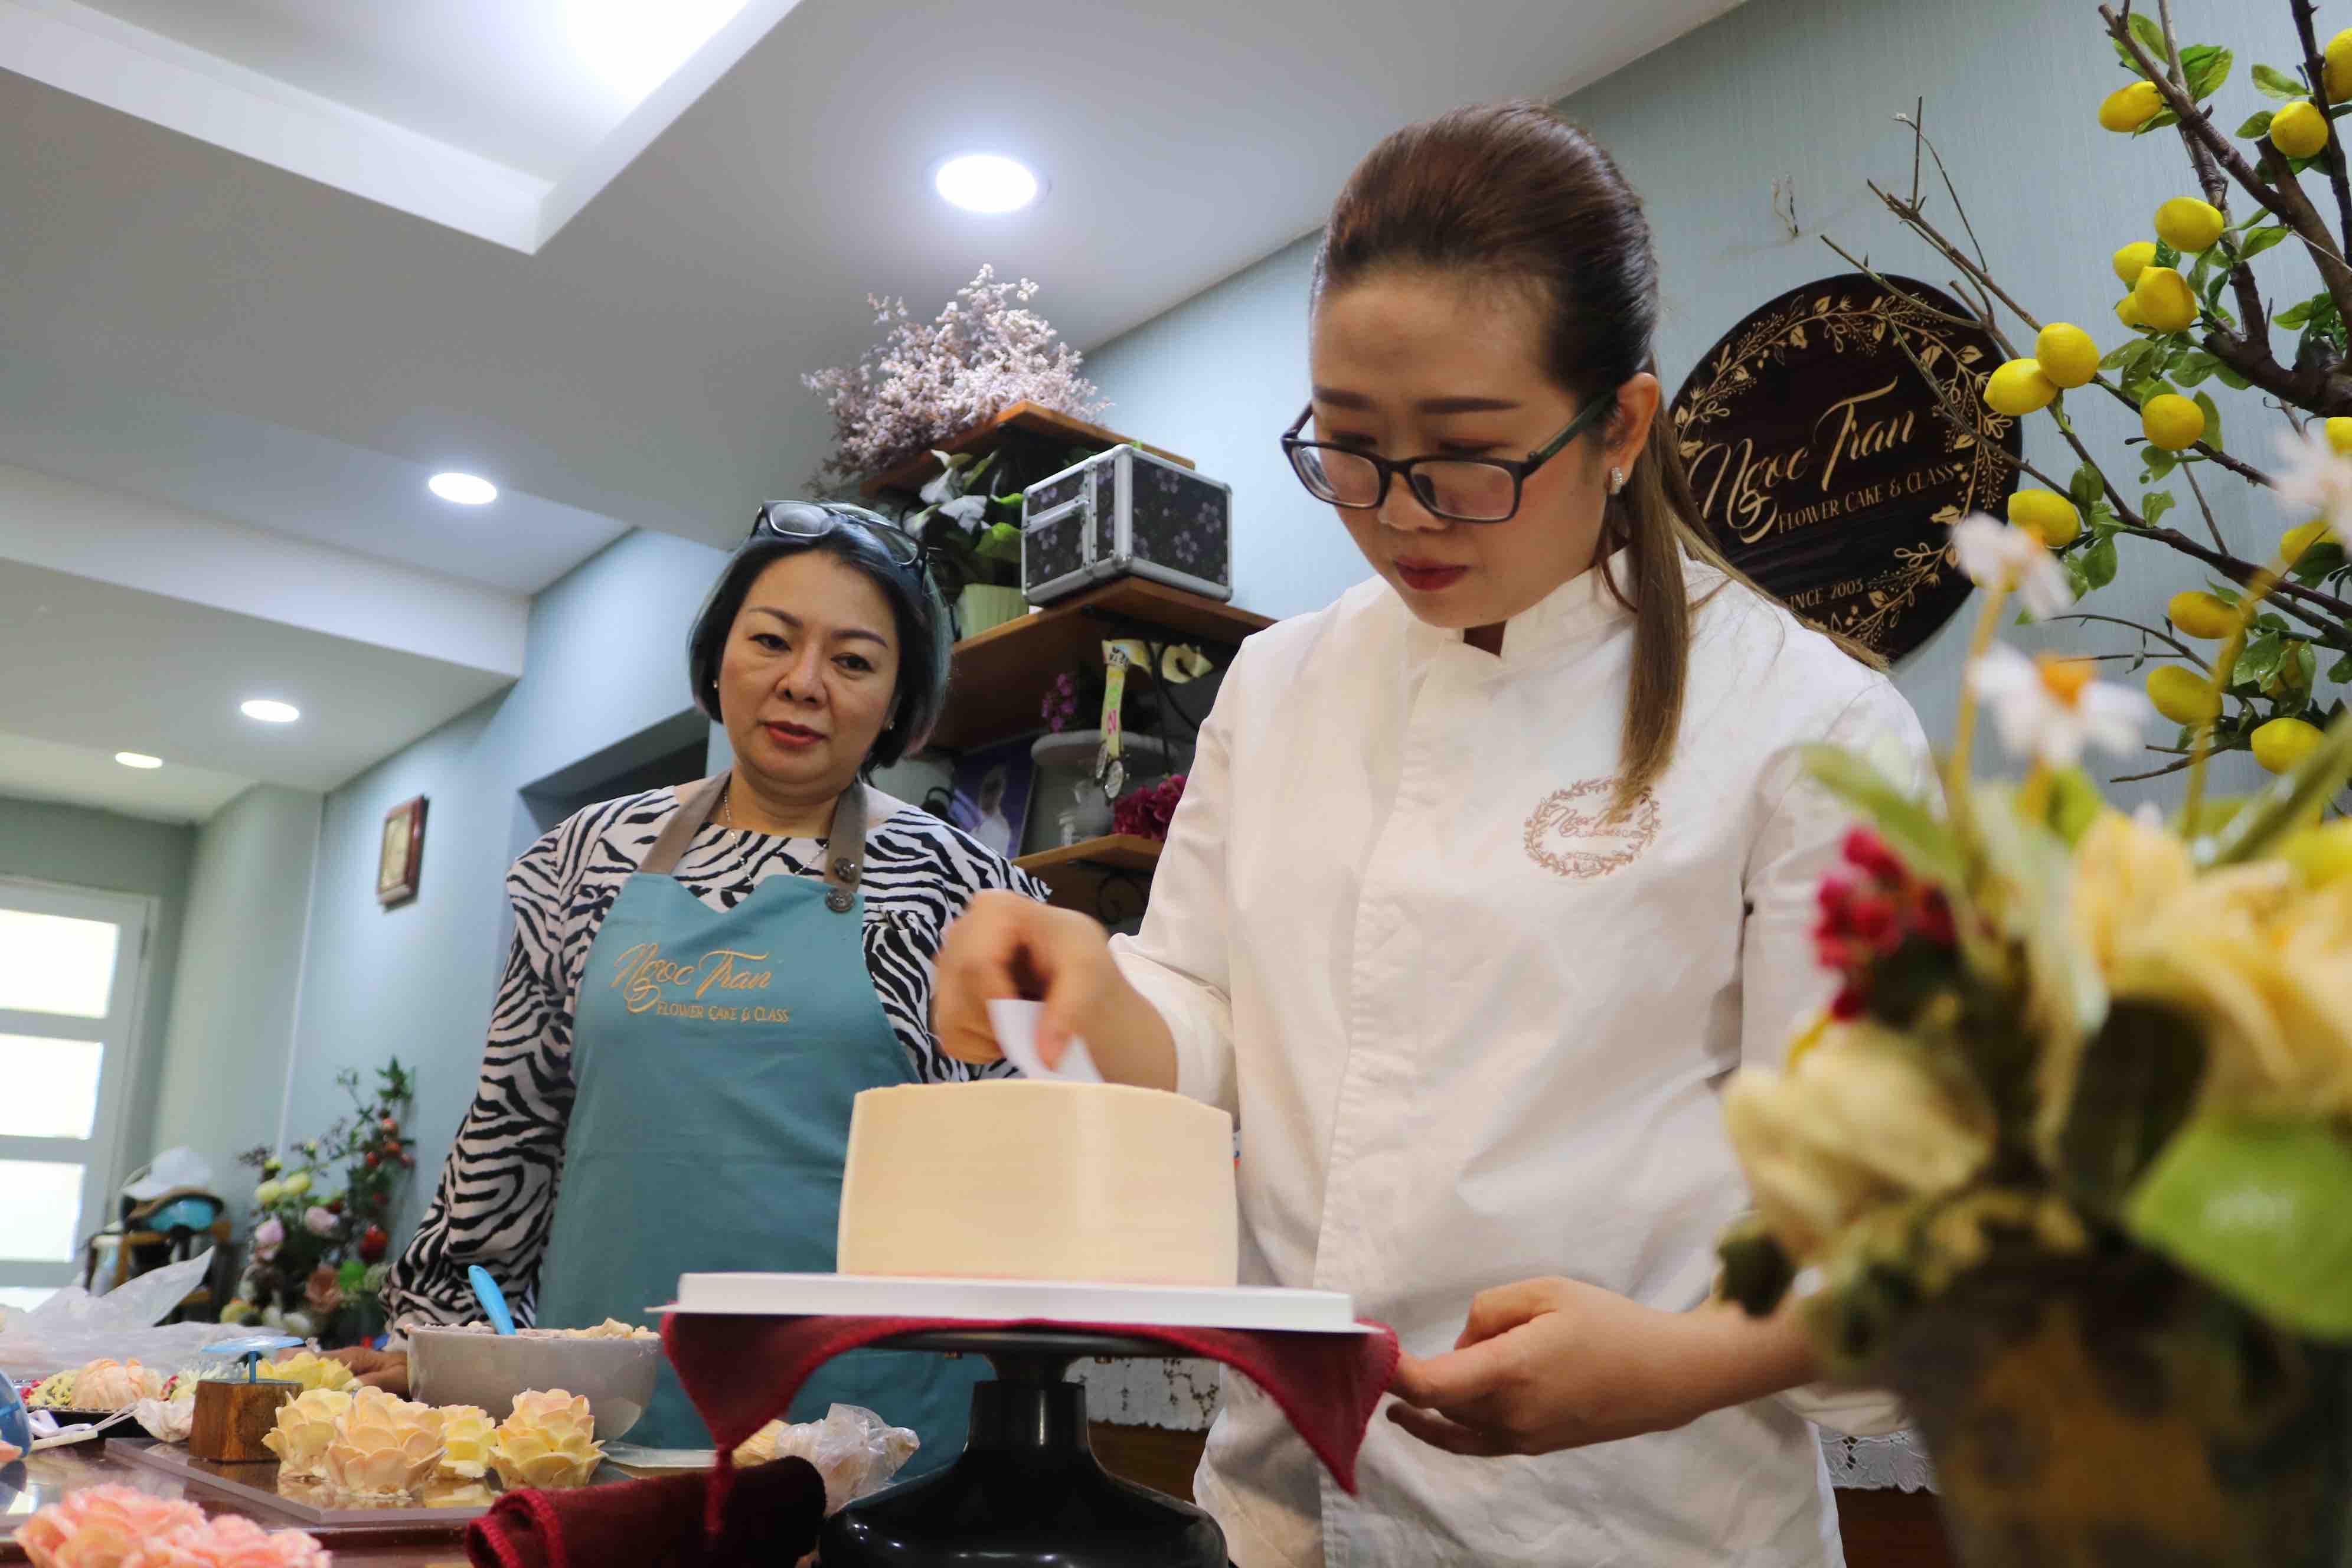 Tran molds buttercream into a beautifully designed cake. Photo: Hoang An / Tuoi Tre